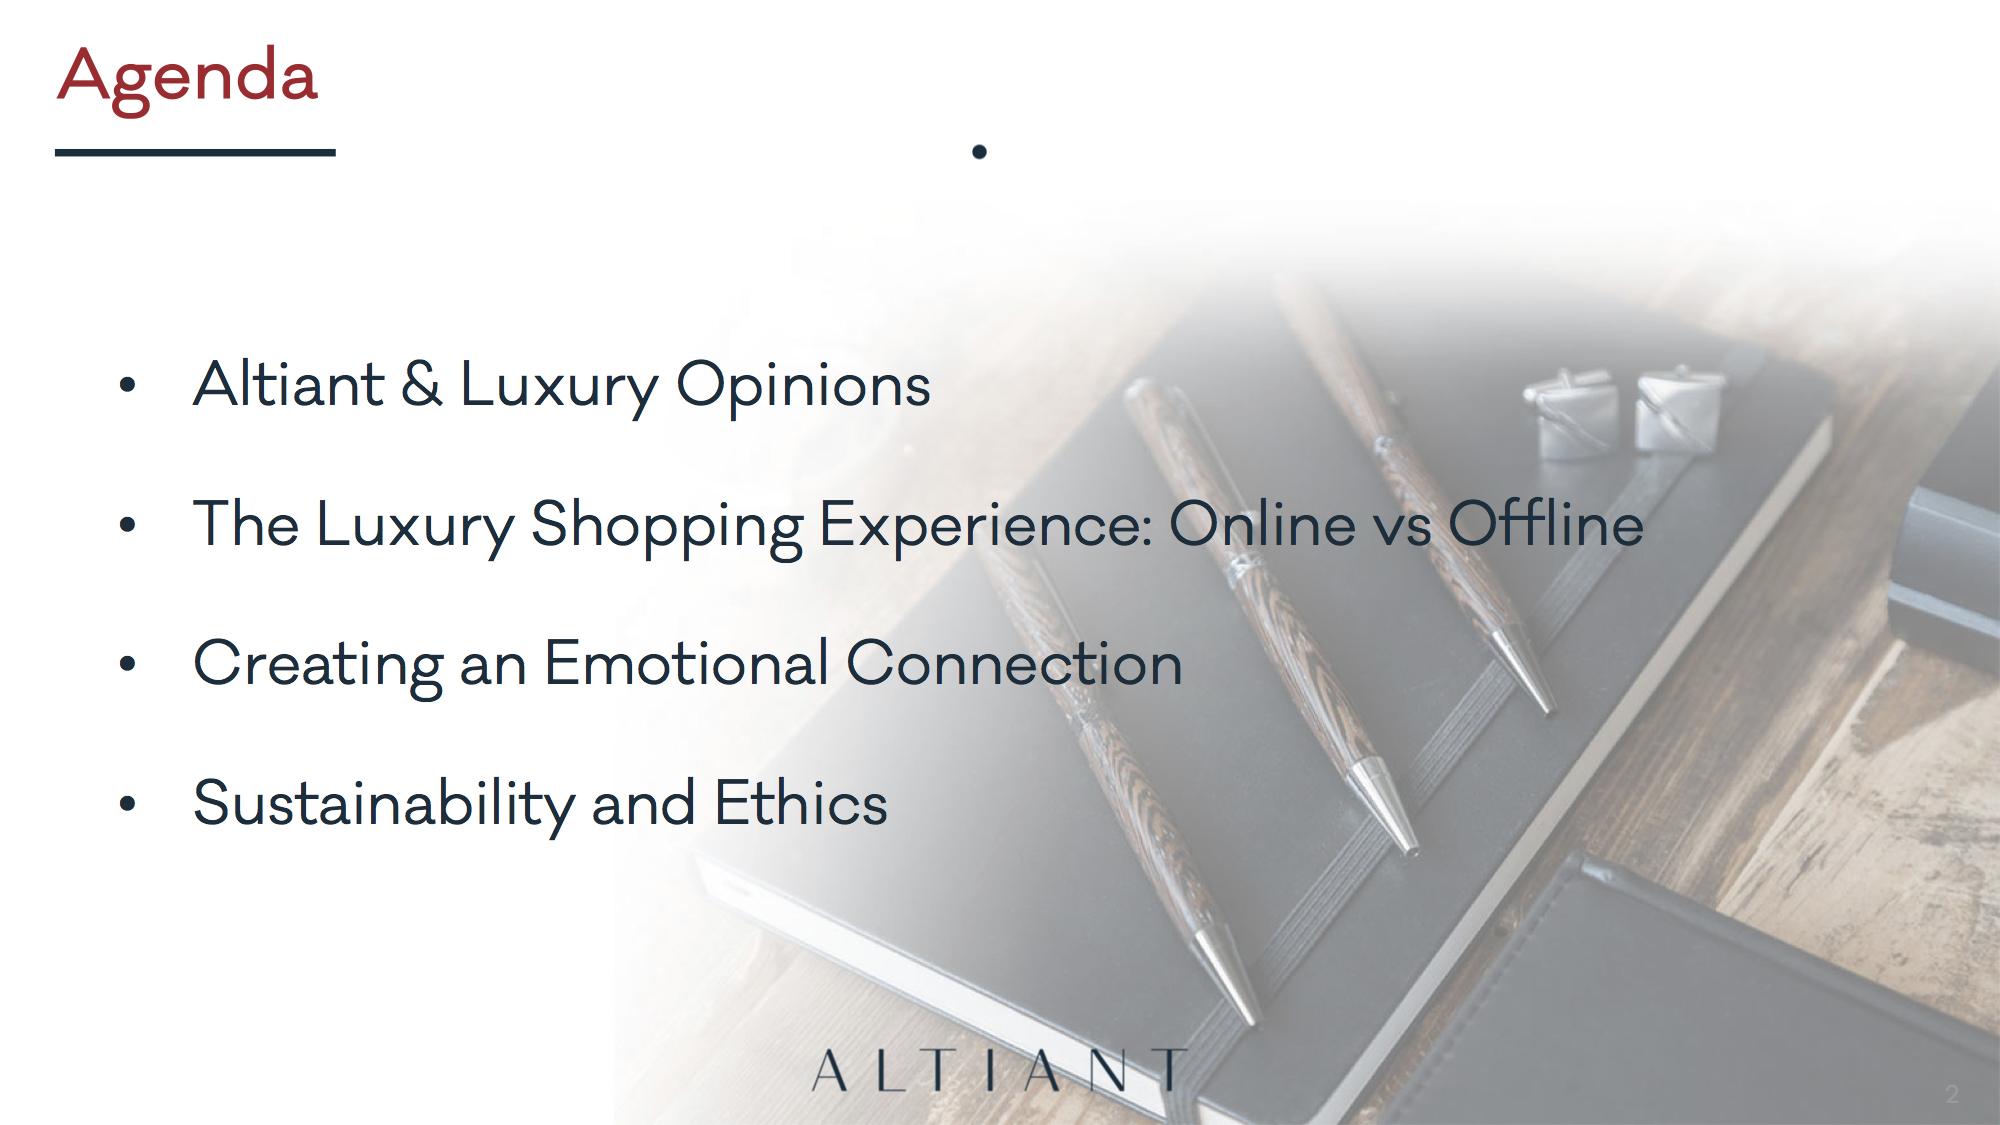 Altiant Key Luxury Trends p2 copy.png